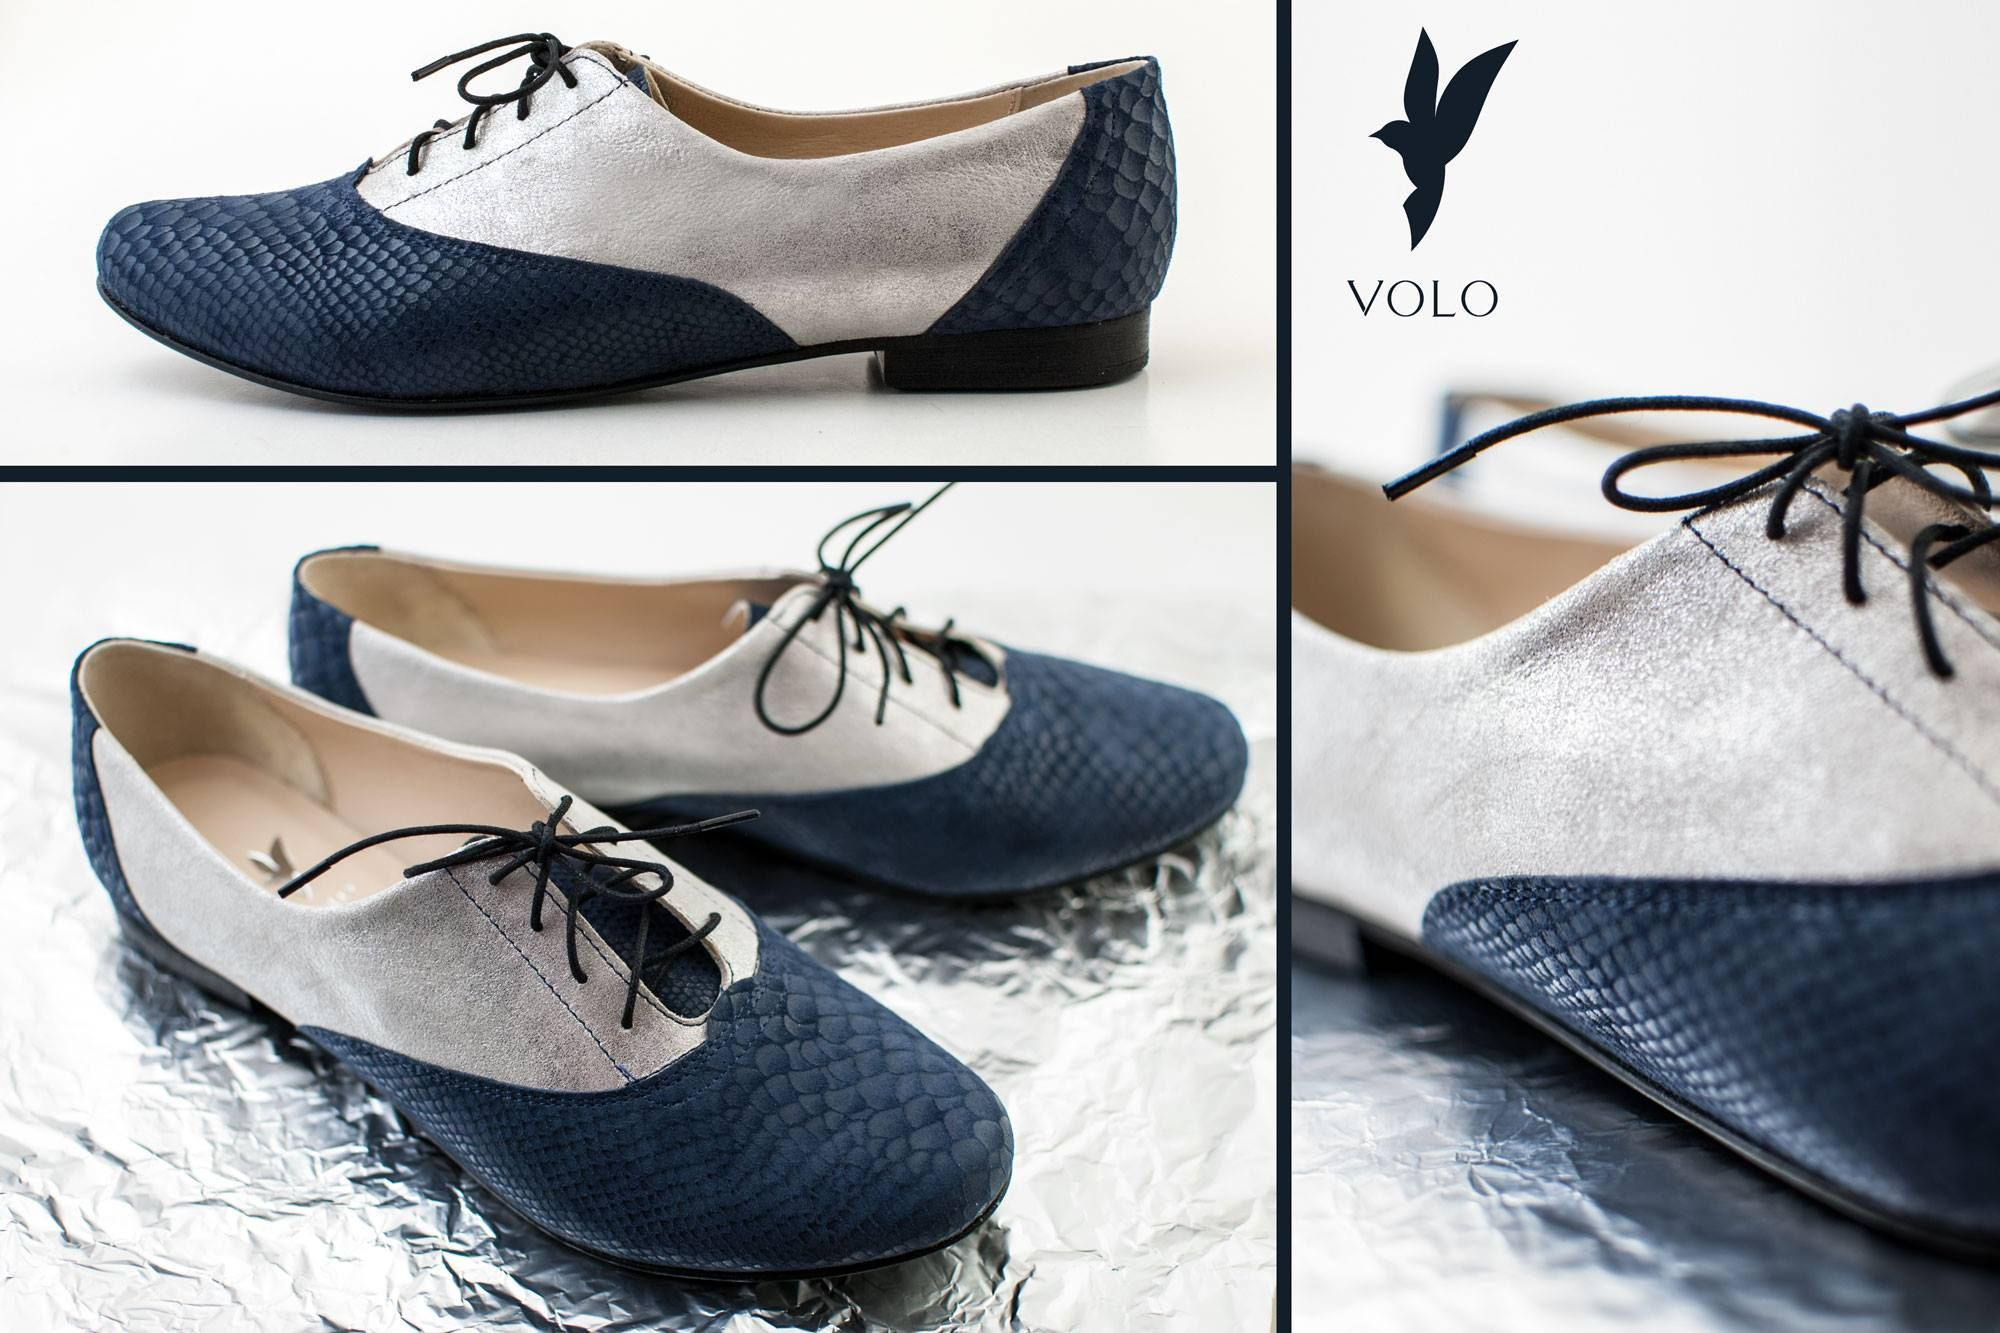 Manufaktura Kobiecego Obuwia Womens Oxfords Oxford Shoes Volo